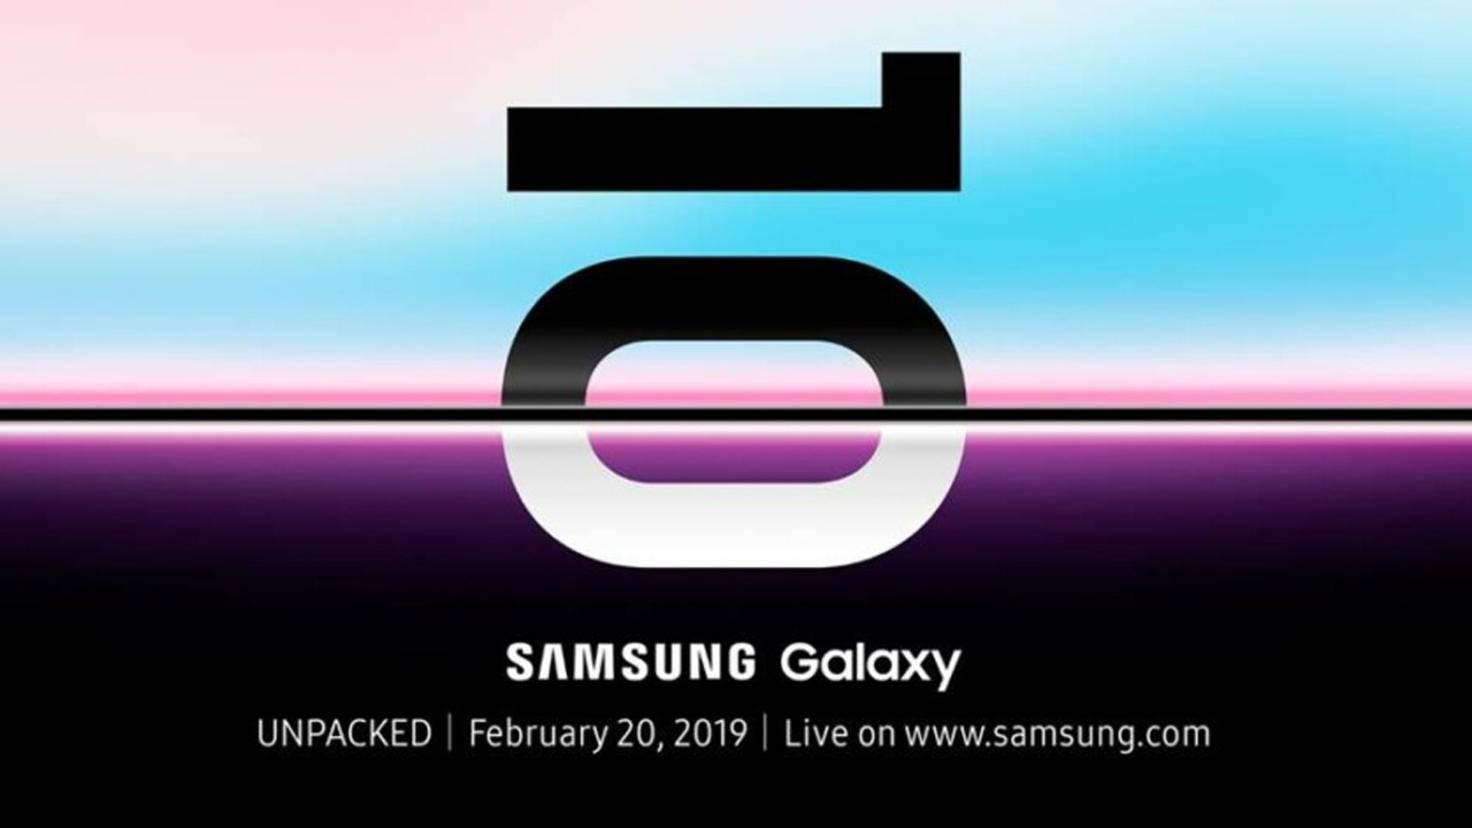 Galaxy S10 Unpacked